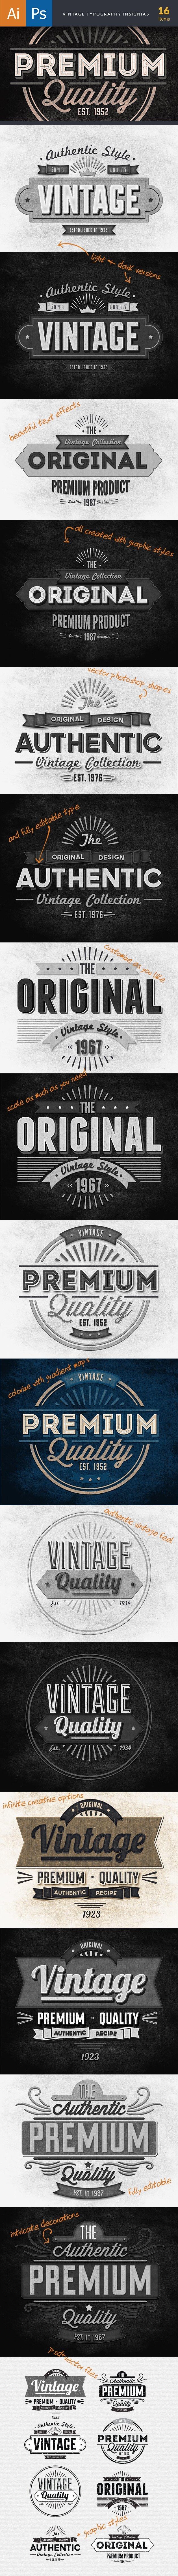 TypeZilla 3: The Super Premium Vintage Typography Set 10